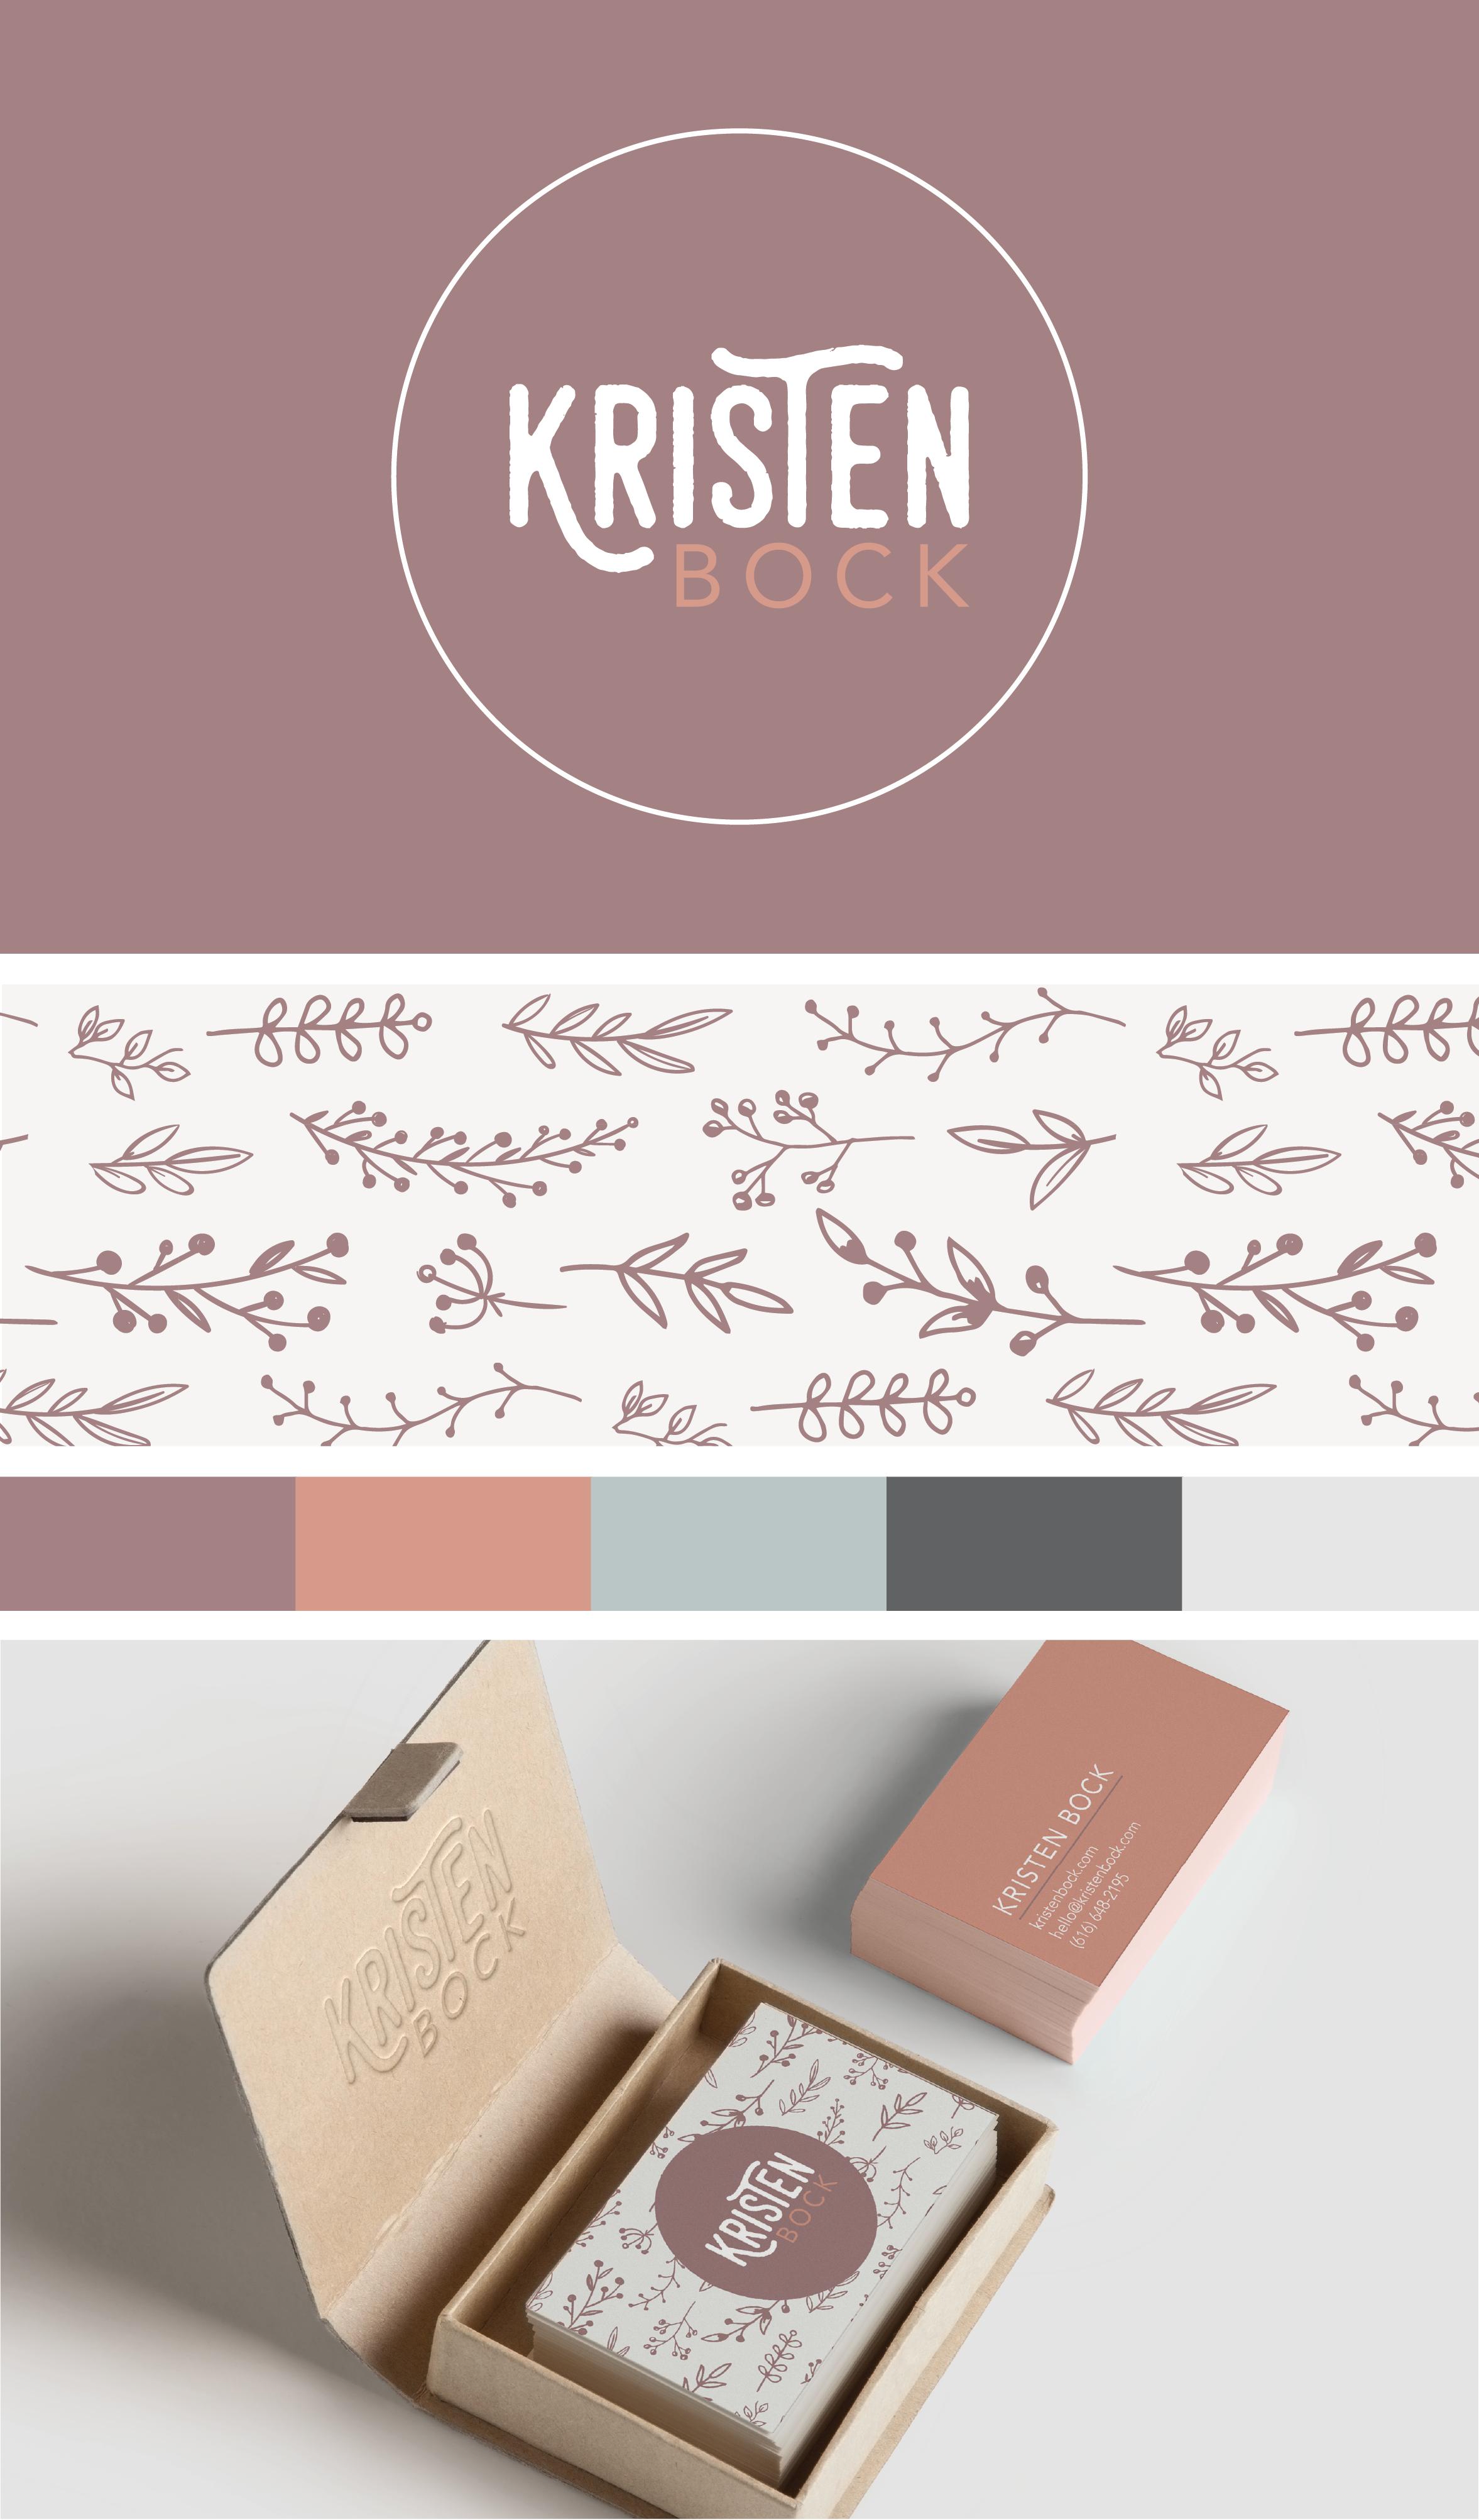 Kristen Bock Brand Designed By Amari Creative